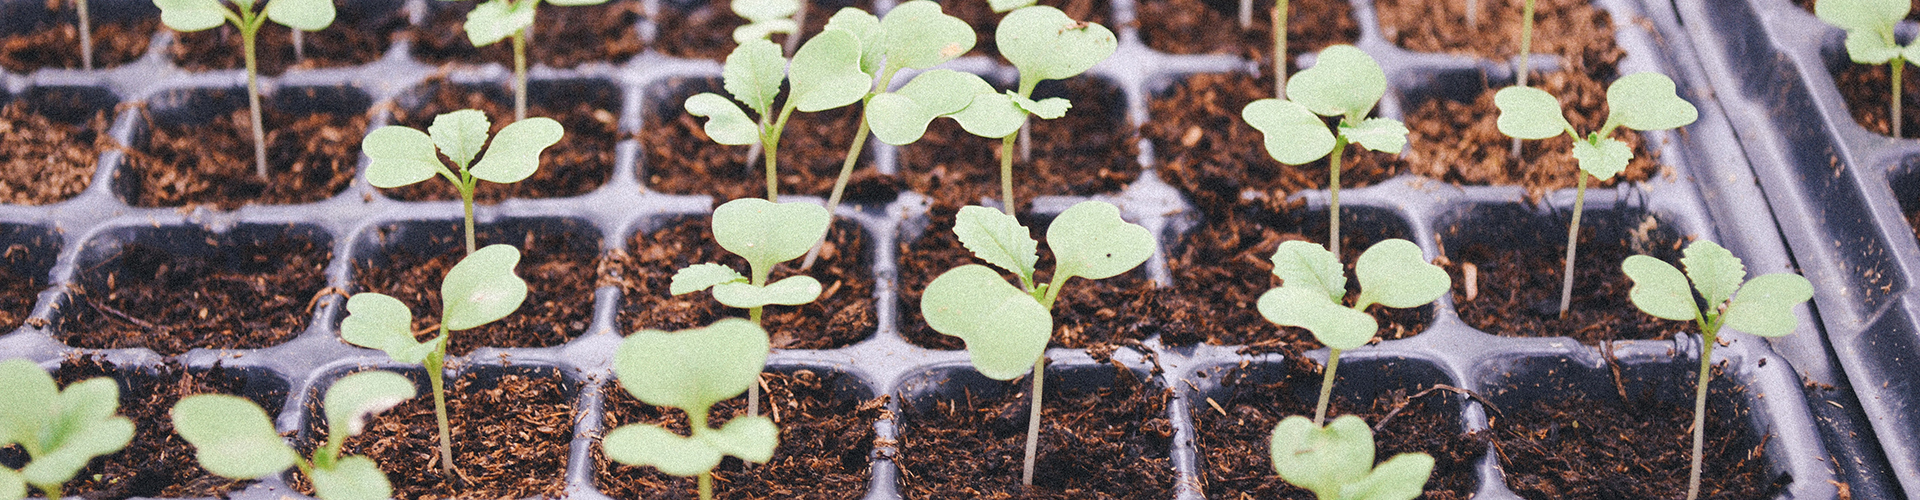 Gardening Seeds Plants